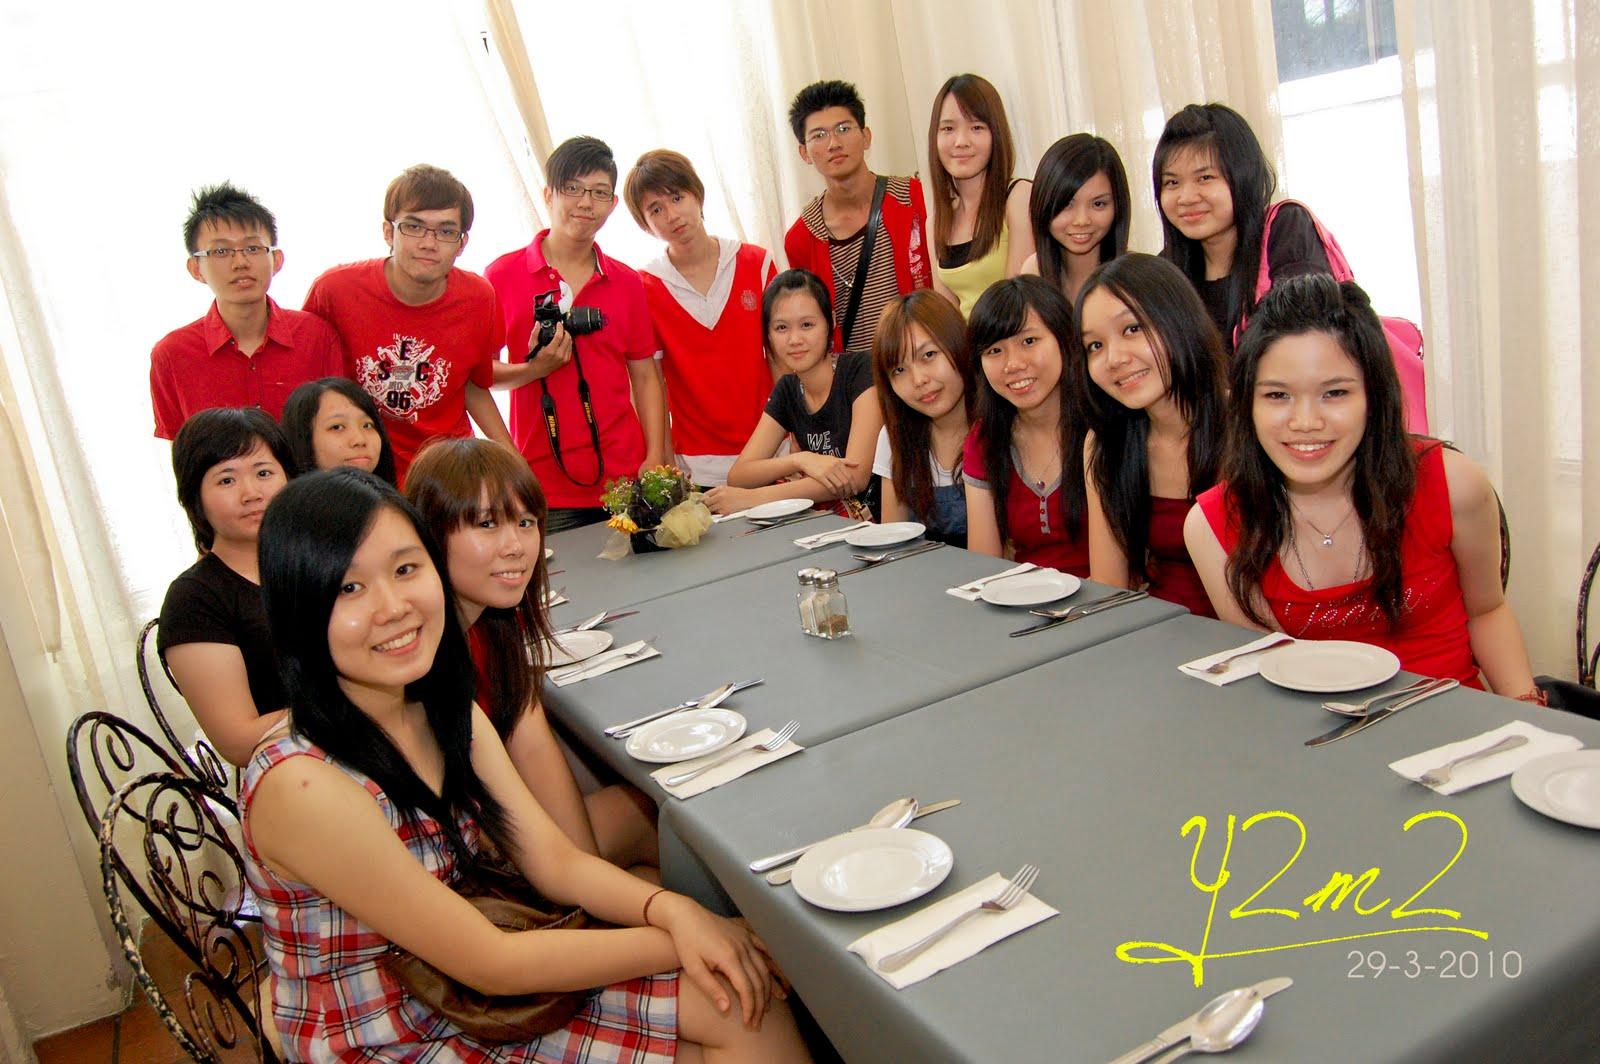 http://1.bp.blogspot.com/_4i5HngzV2GE/S7ioUgbUsBI/AAAAAAAABFI/yGRAnww_-ew/s1600/Y2M2+2010+copy.jpg